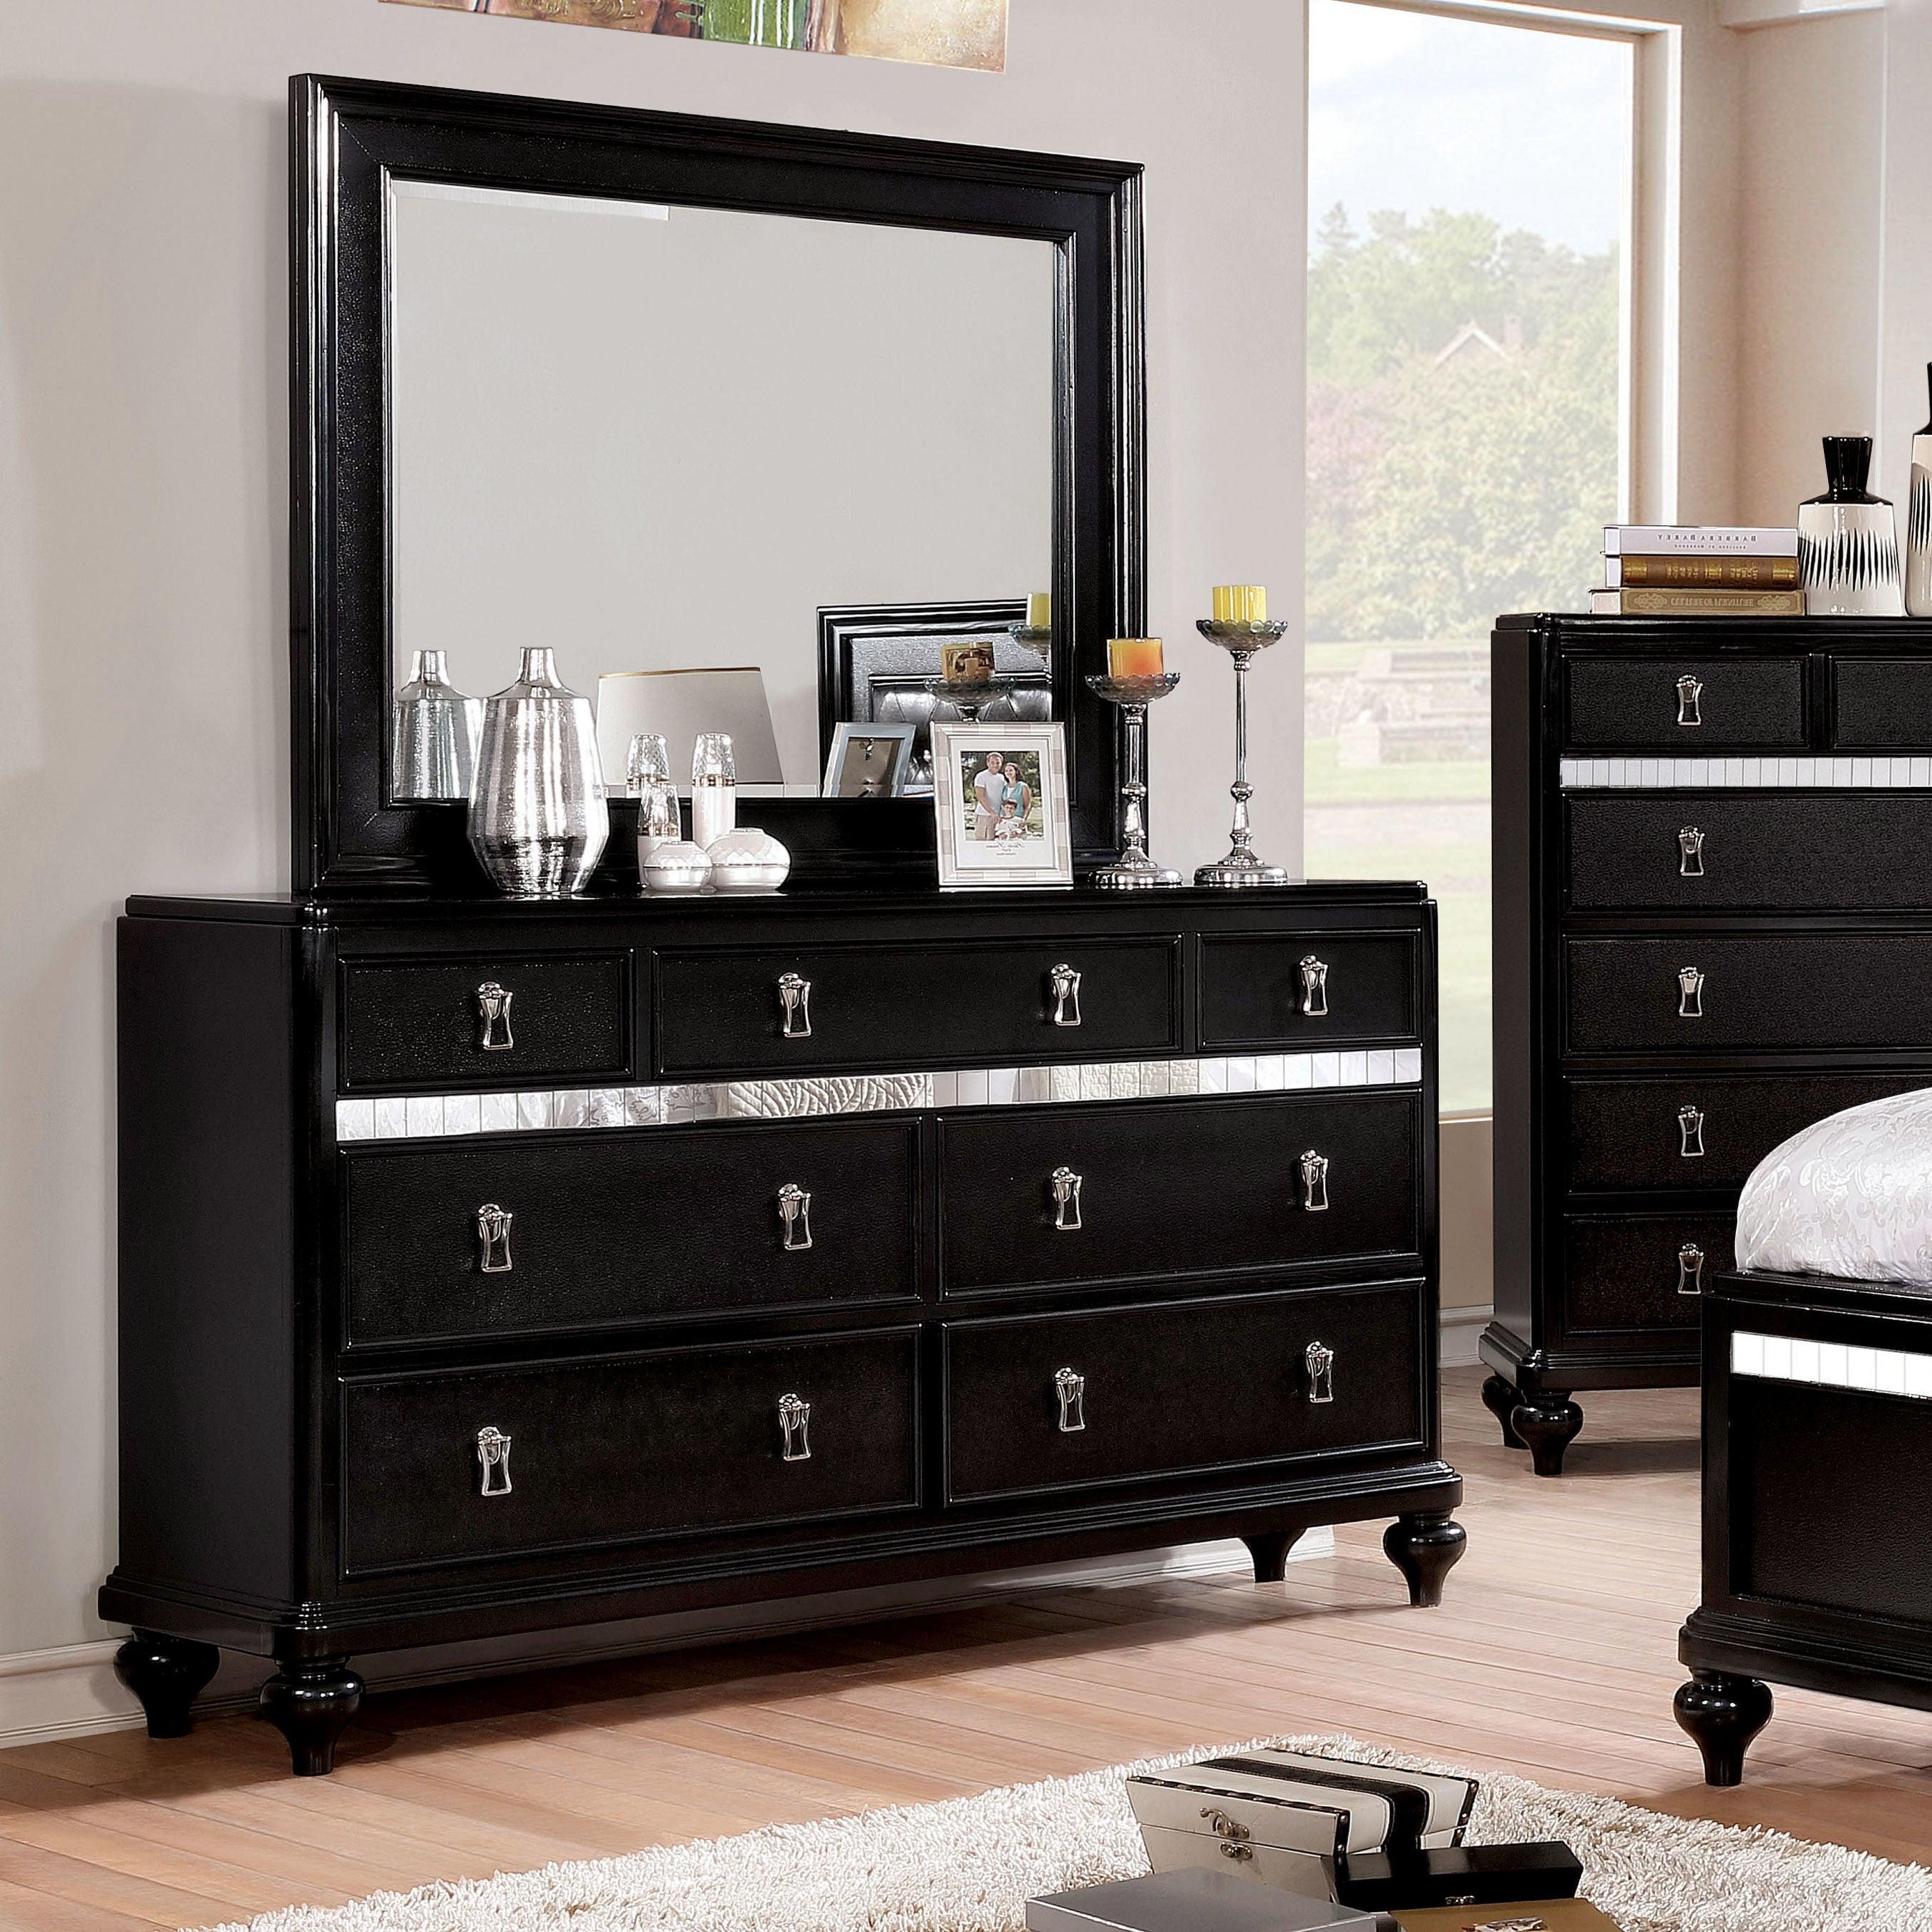 ashley creek mirror set and oh coal furniture dresser product best dealer store mentor